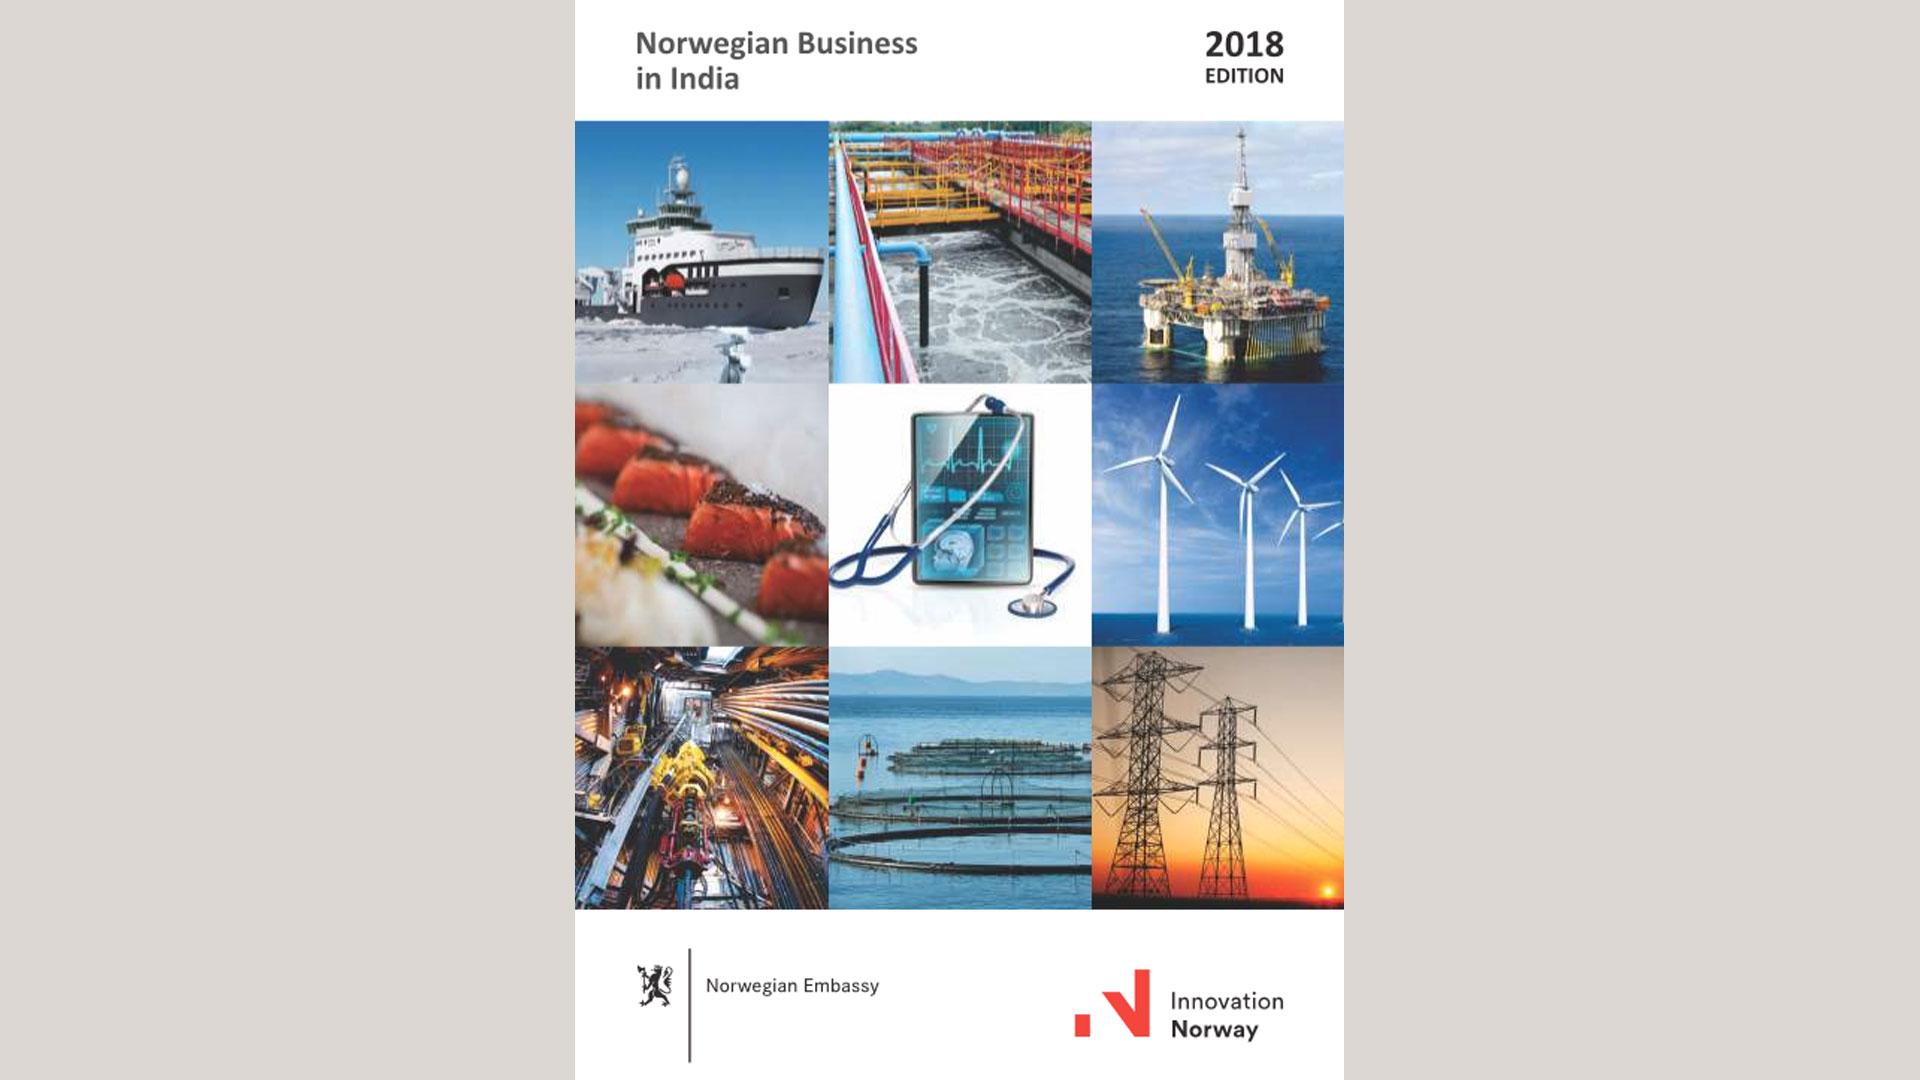 Norwegian Business in India 2018 Edition